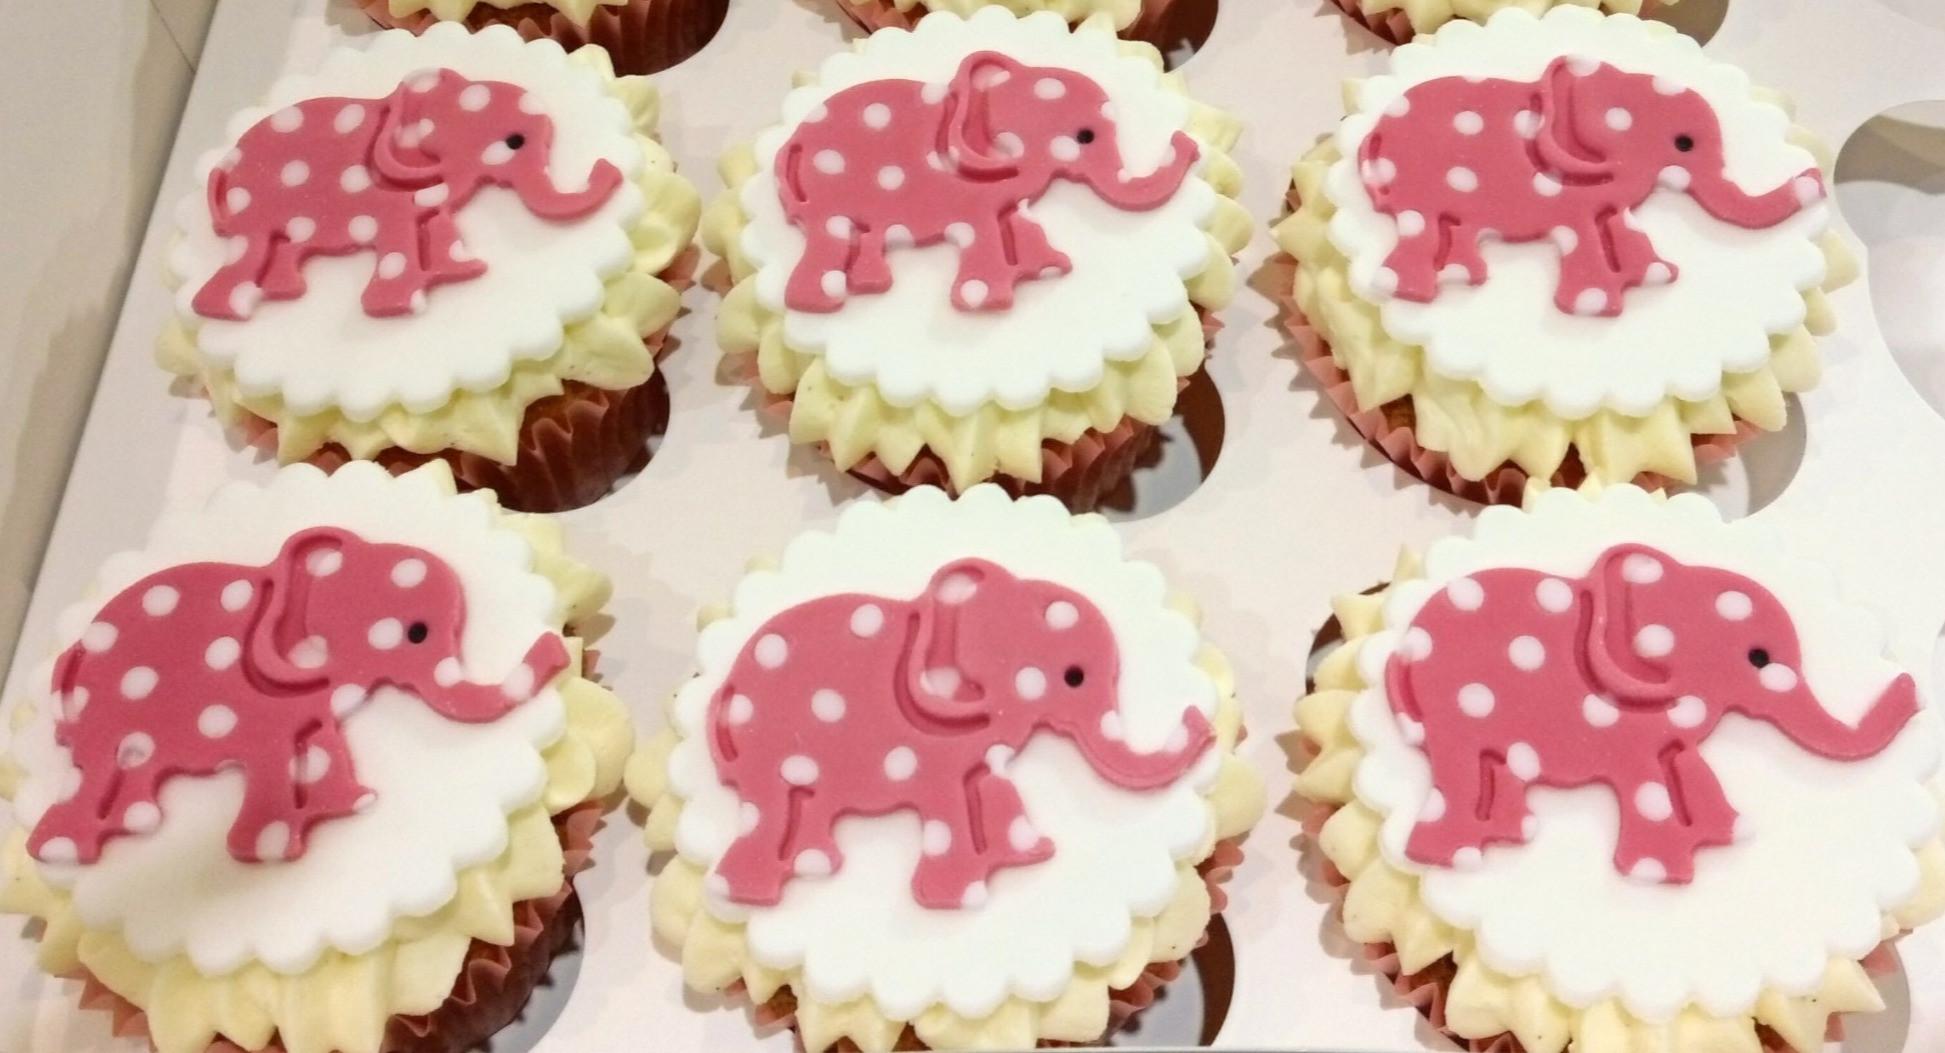 Pink Polka Dot Elephant Cupcakes